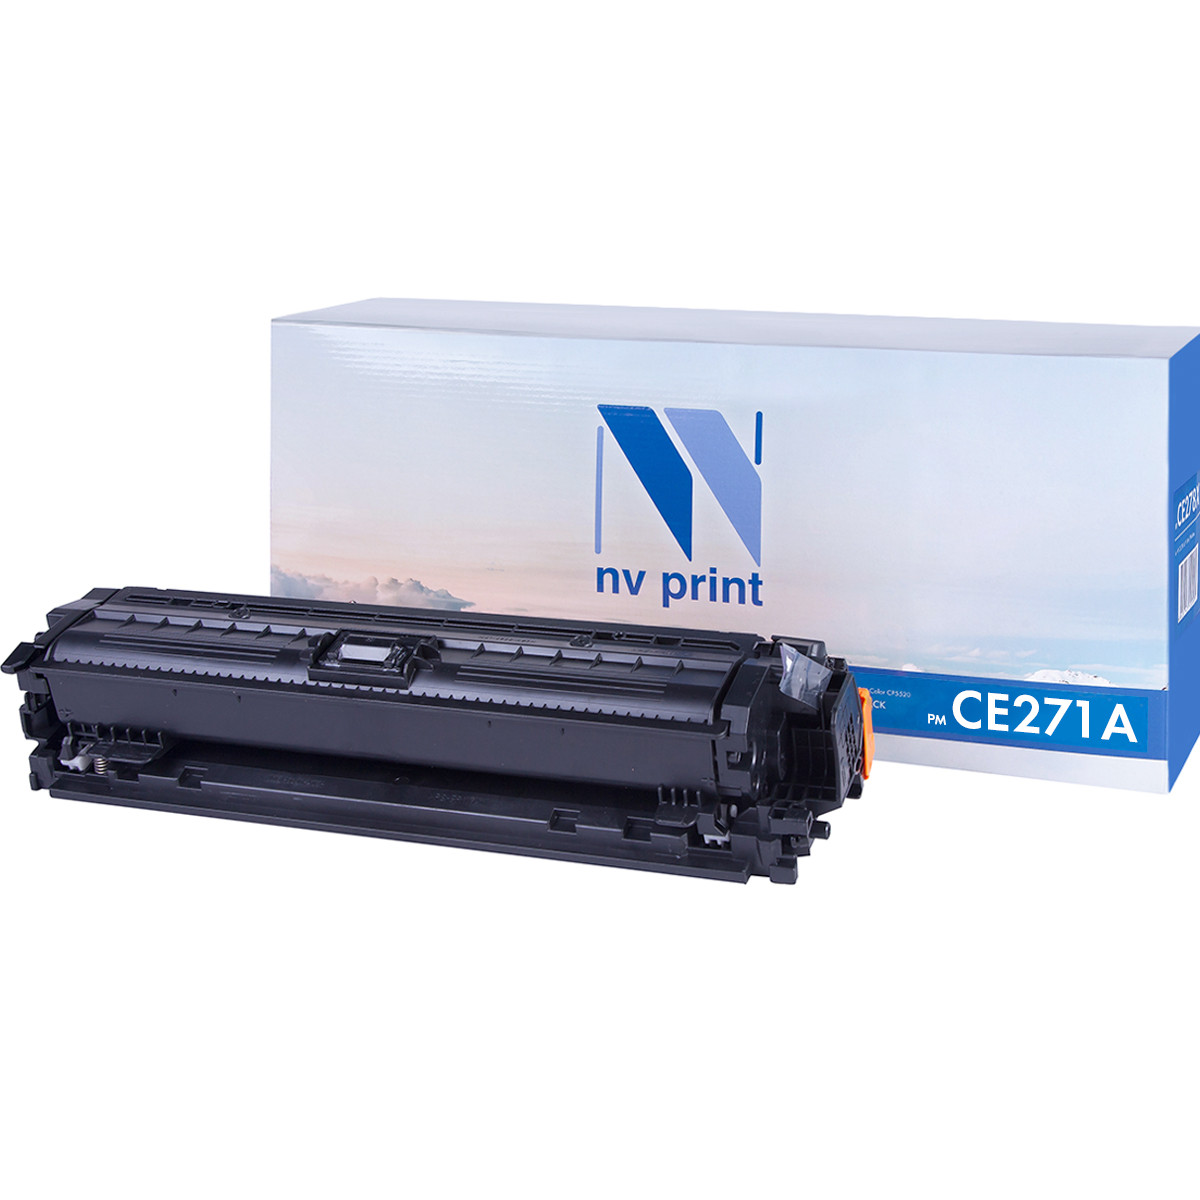 Картридж NVP совместимый HP CE271A Cyan для LaserJet Color CP5525dn/CP5525n/CP5525xh/M750dn/M750n/M7